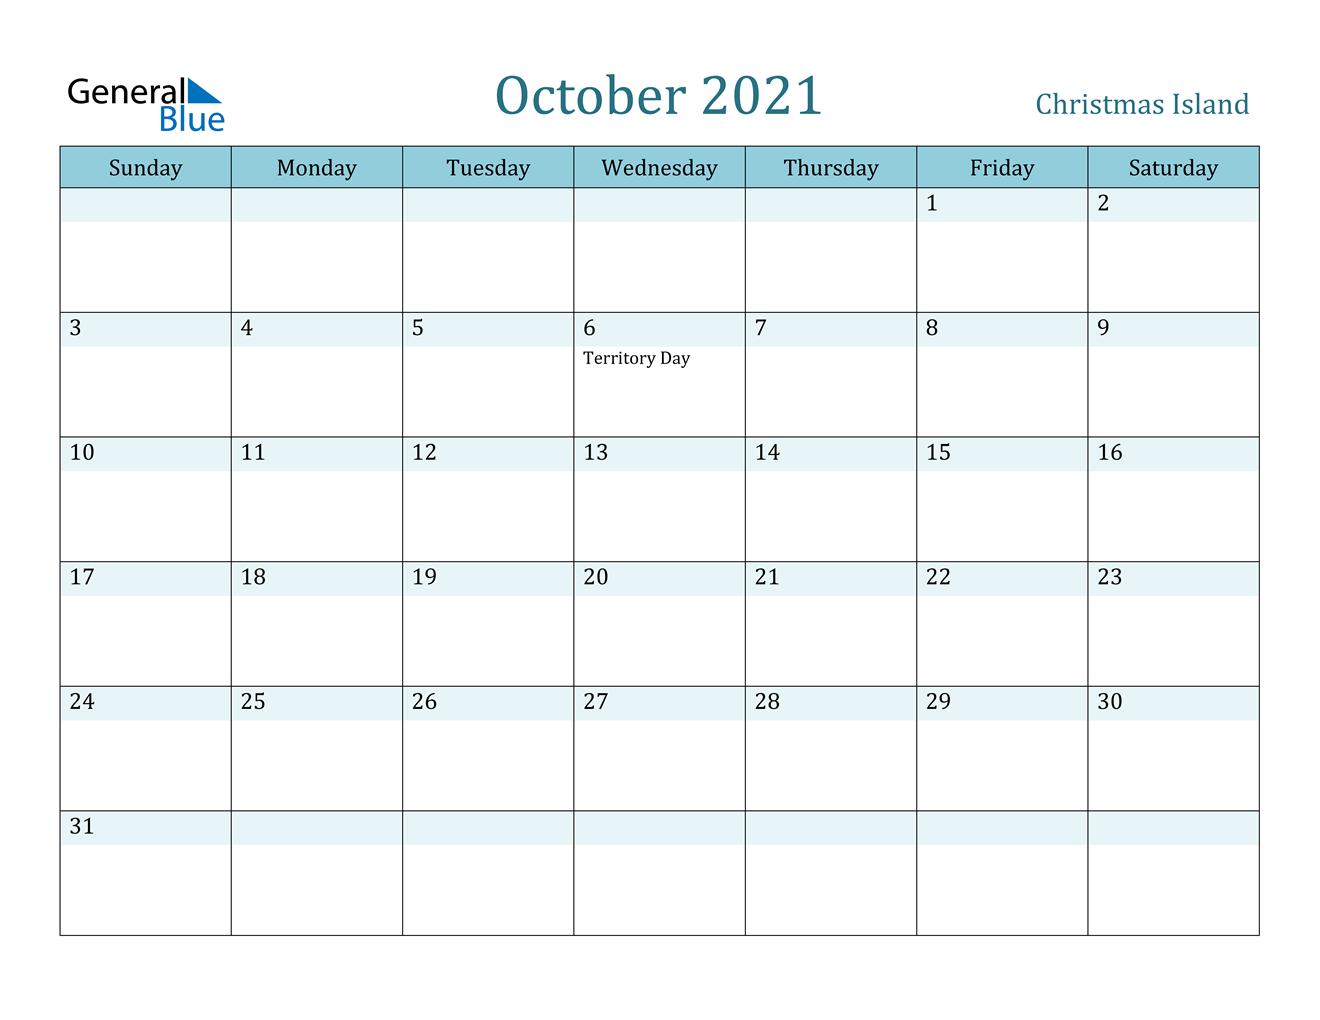 Christmas Island October 2021 Calendar With Holidays